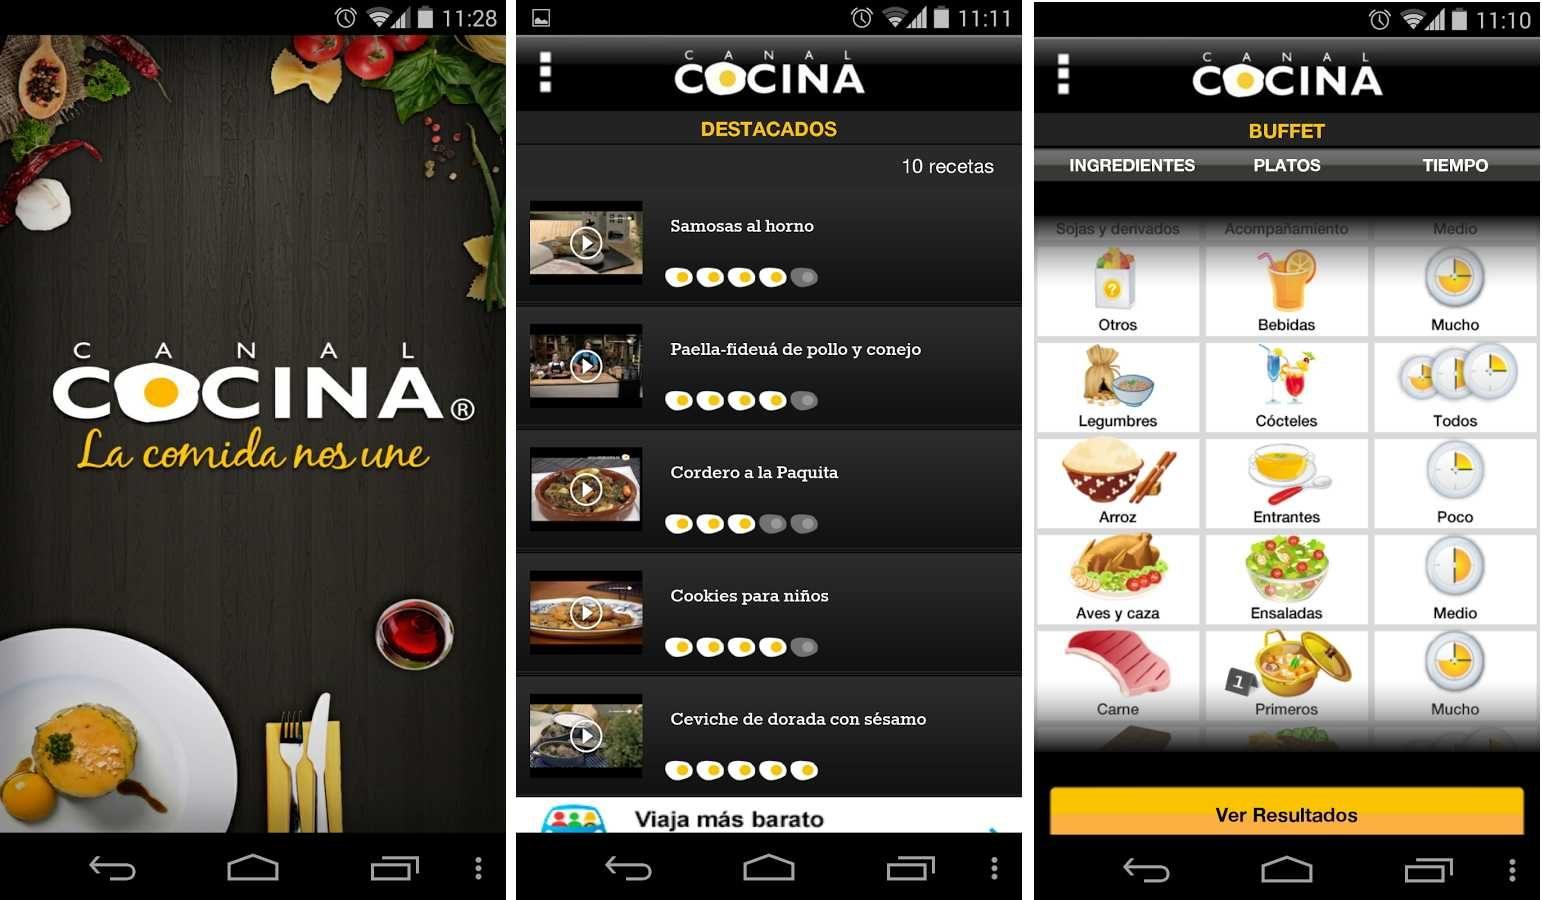 Recetas en Android con Canal Cocina